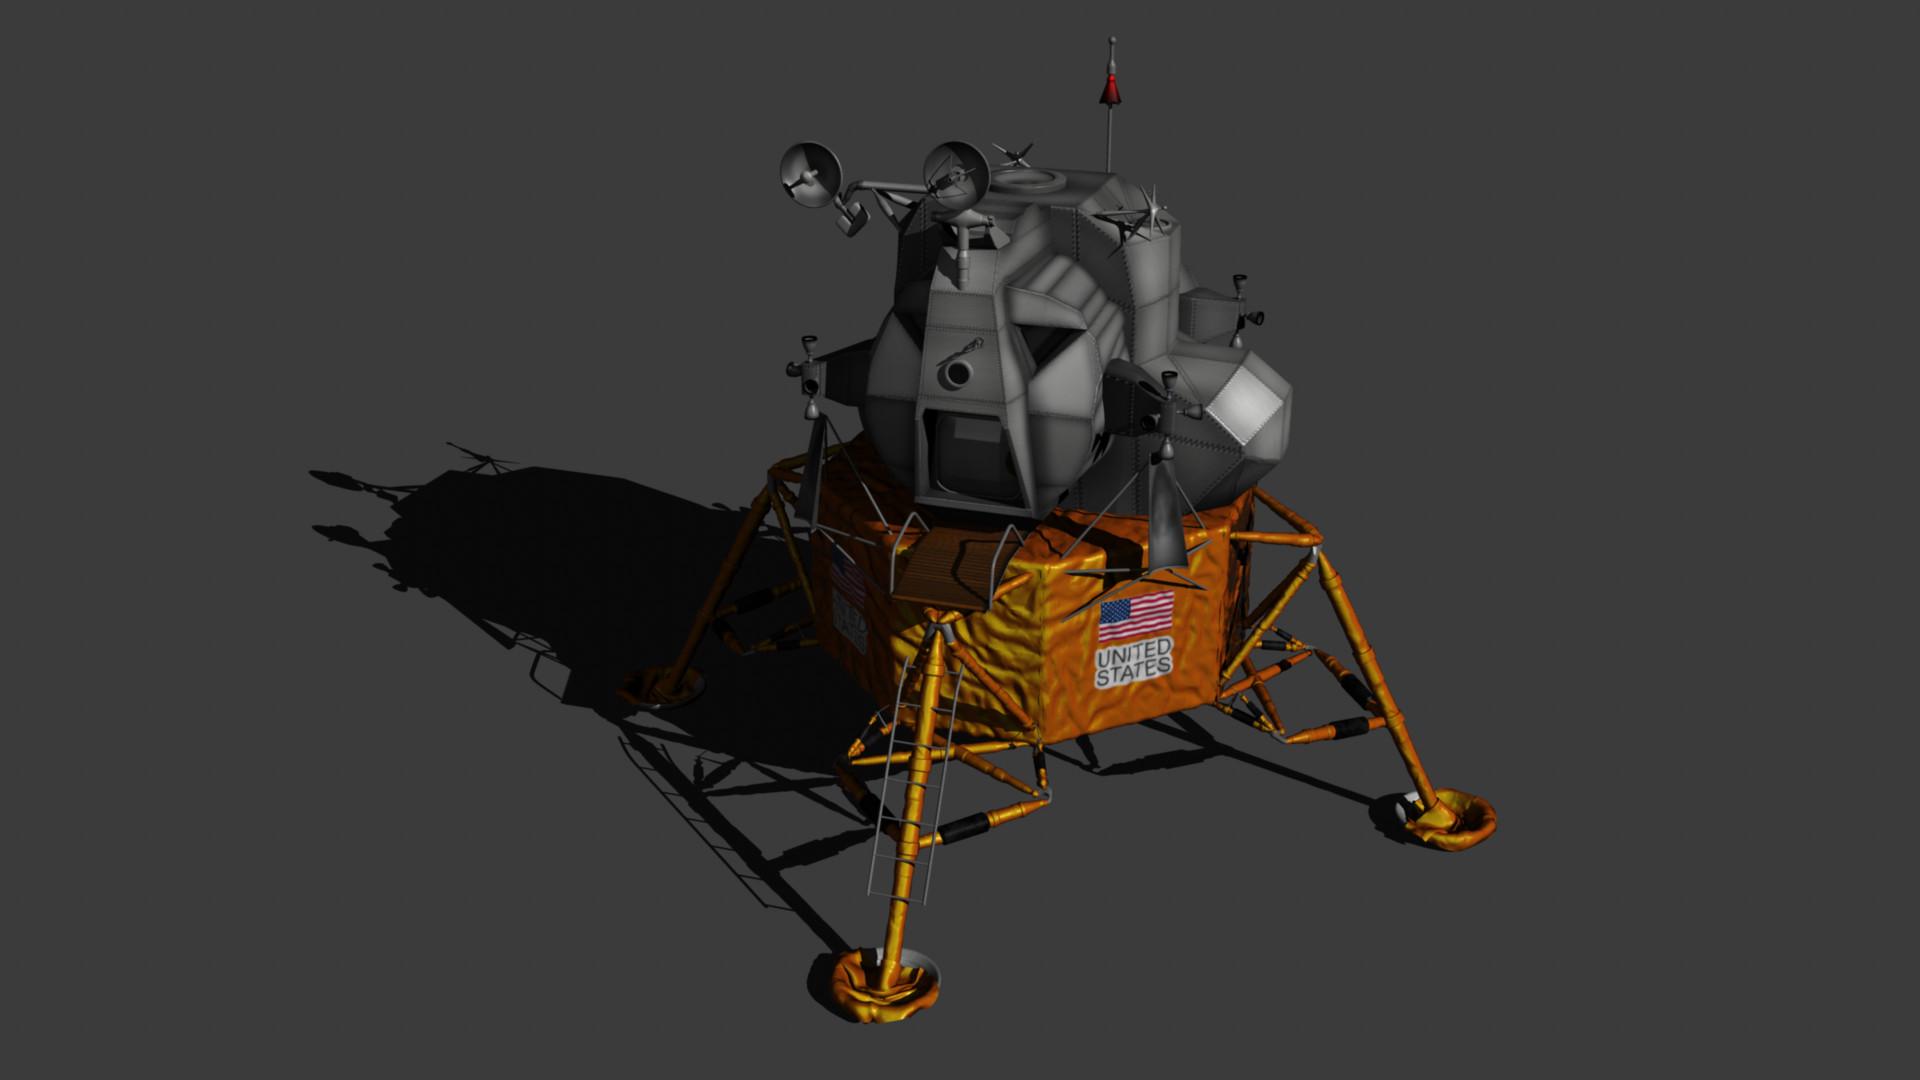 Lunar Module Eagle Textured by Denuvyer on DeviantArt